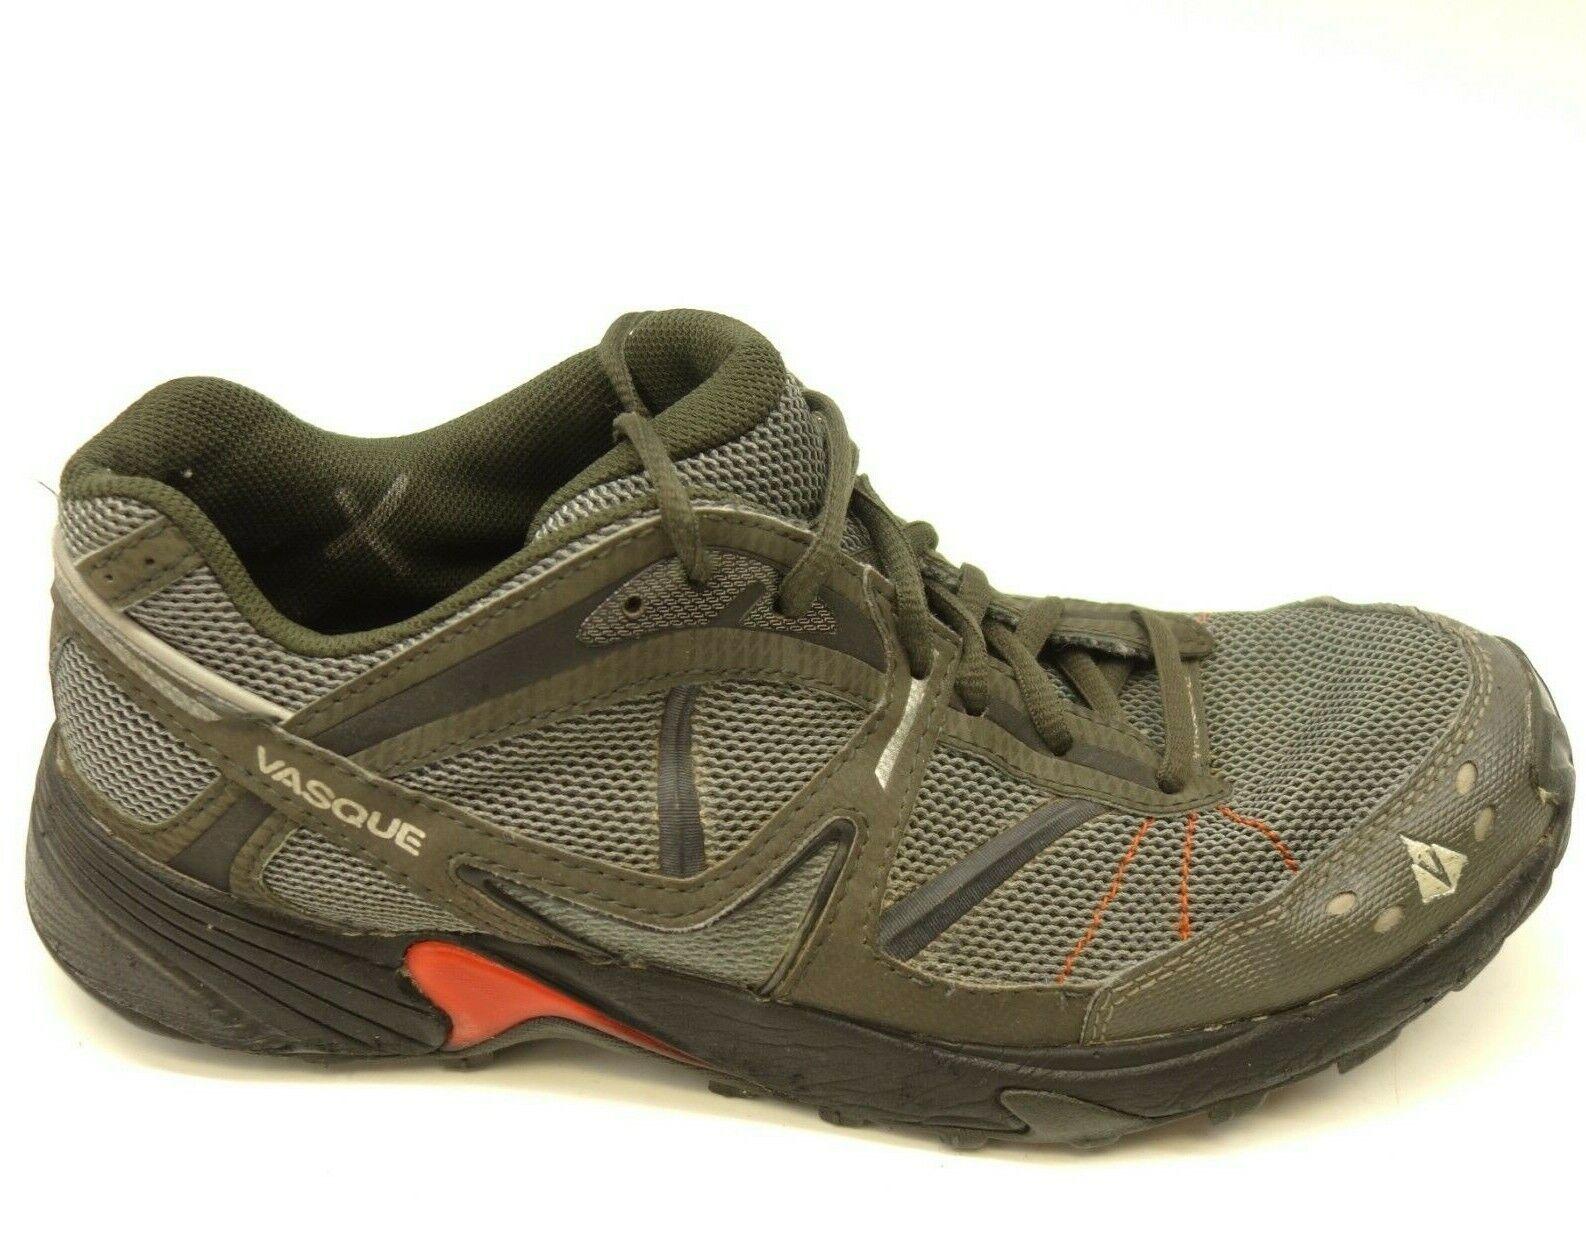 Vasque US 9.5 gris Trail-Correr Atléticos Ligero Zapatos para hombre